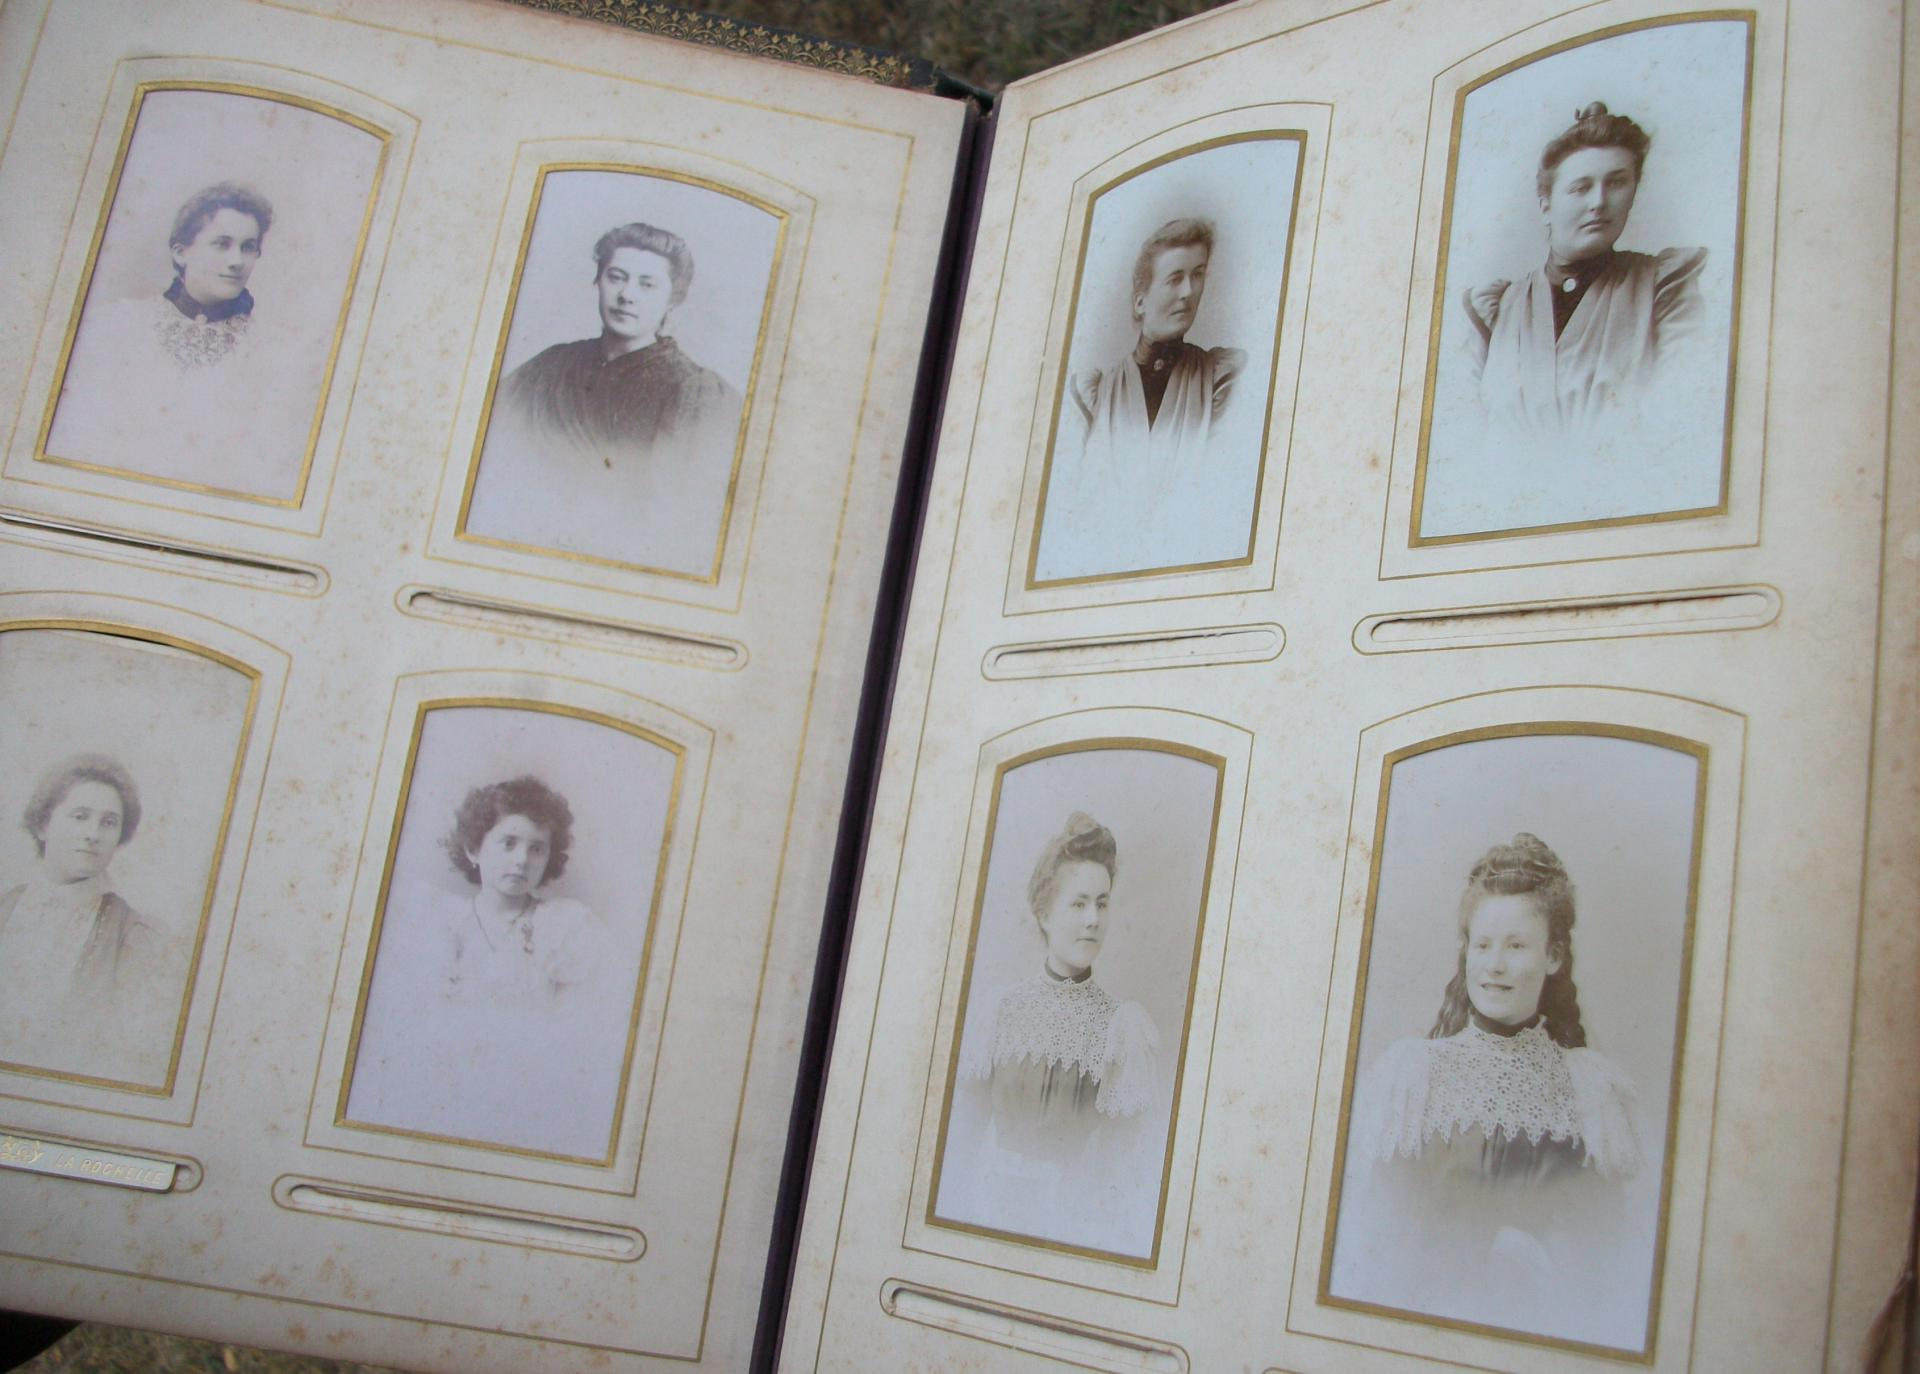 7 pensionnat albums eleves 1910 imgp0102